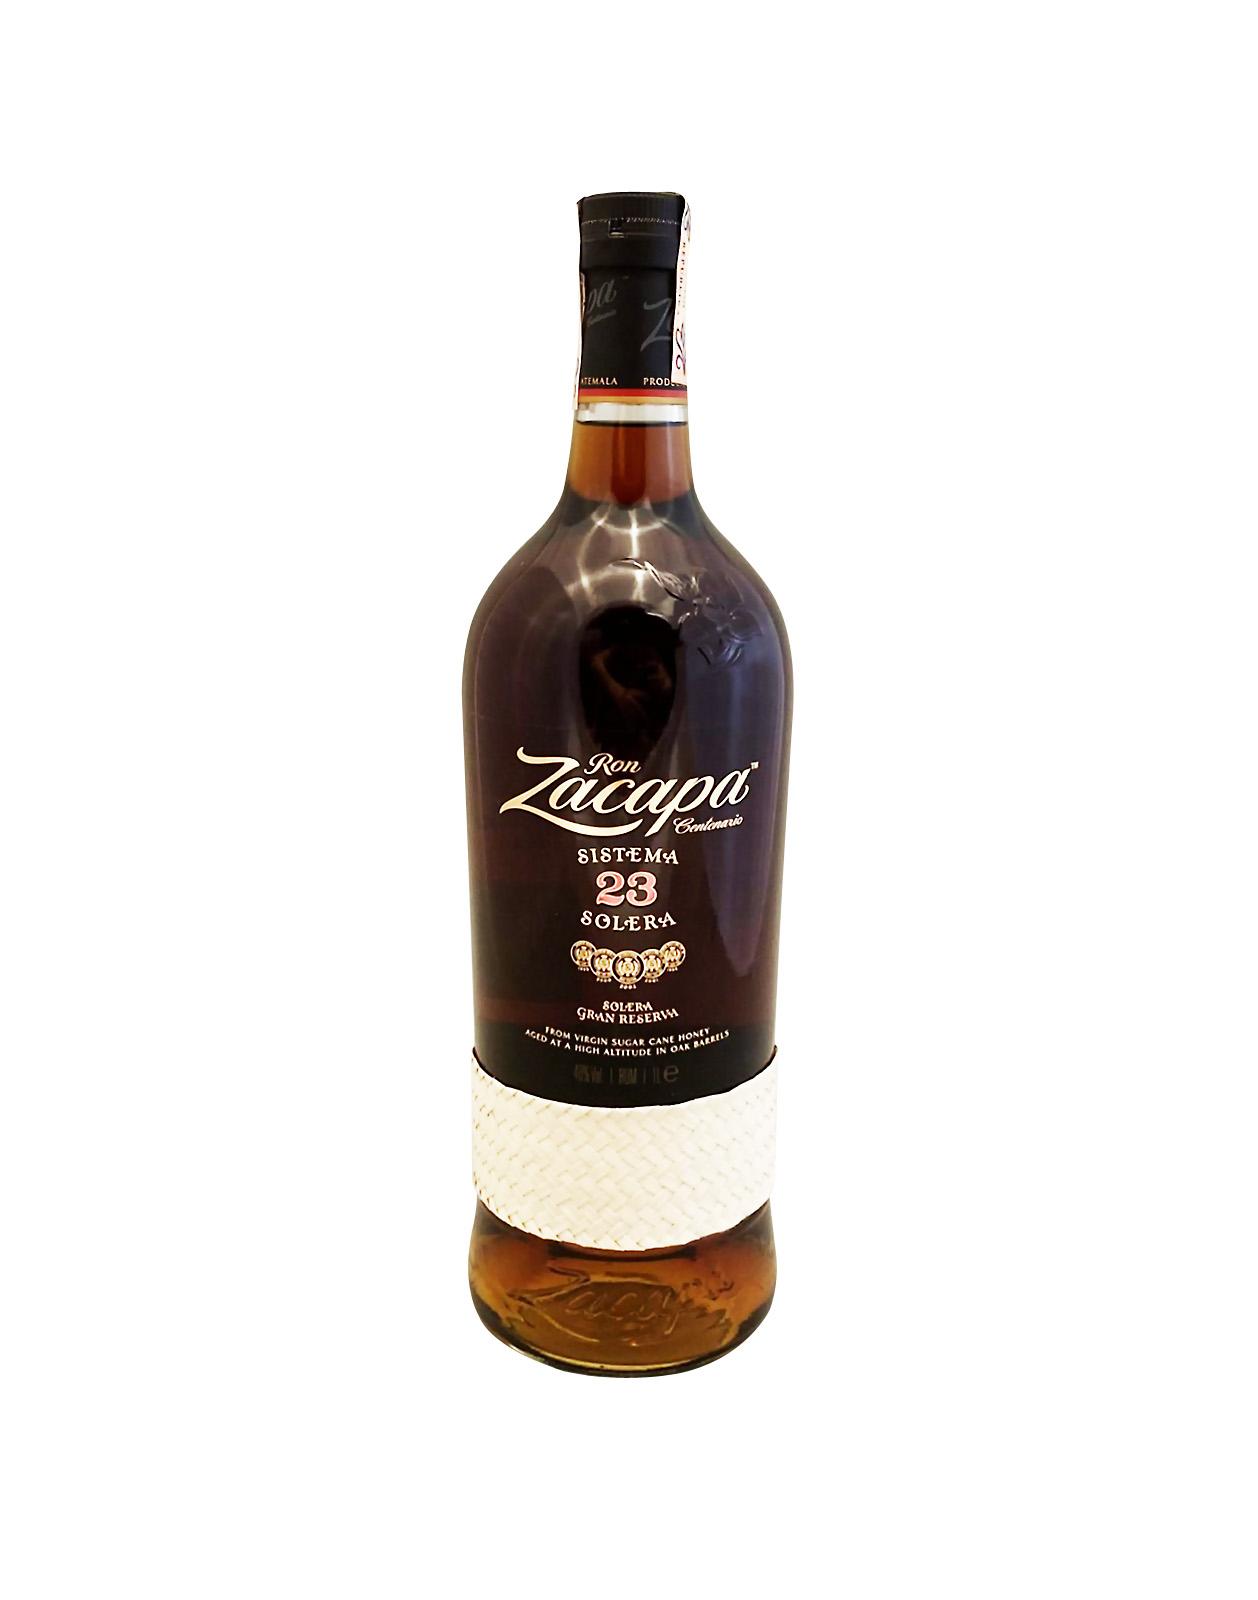 Zacappa Centenario 23 YO 40%, Bottleshop Sunny wines slnecnice mesto, petrzalka, rum, rozvoz alkoholu, eshop